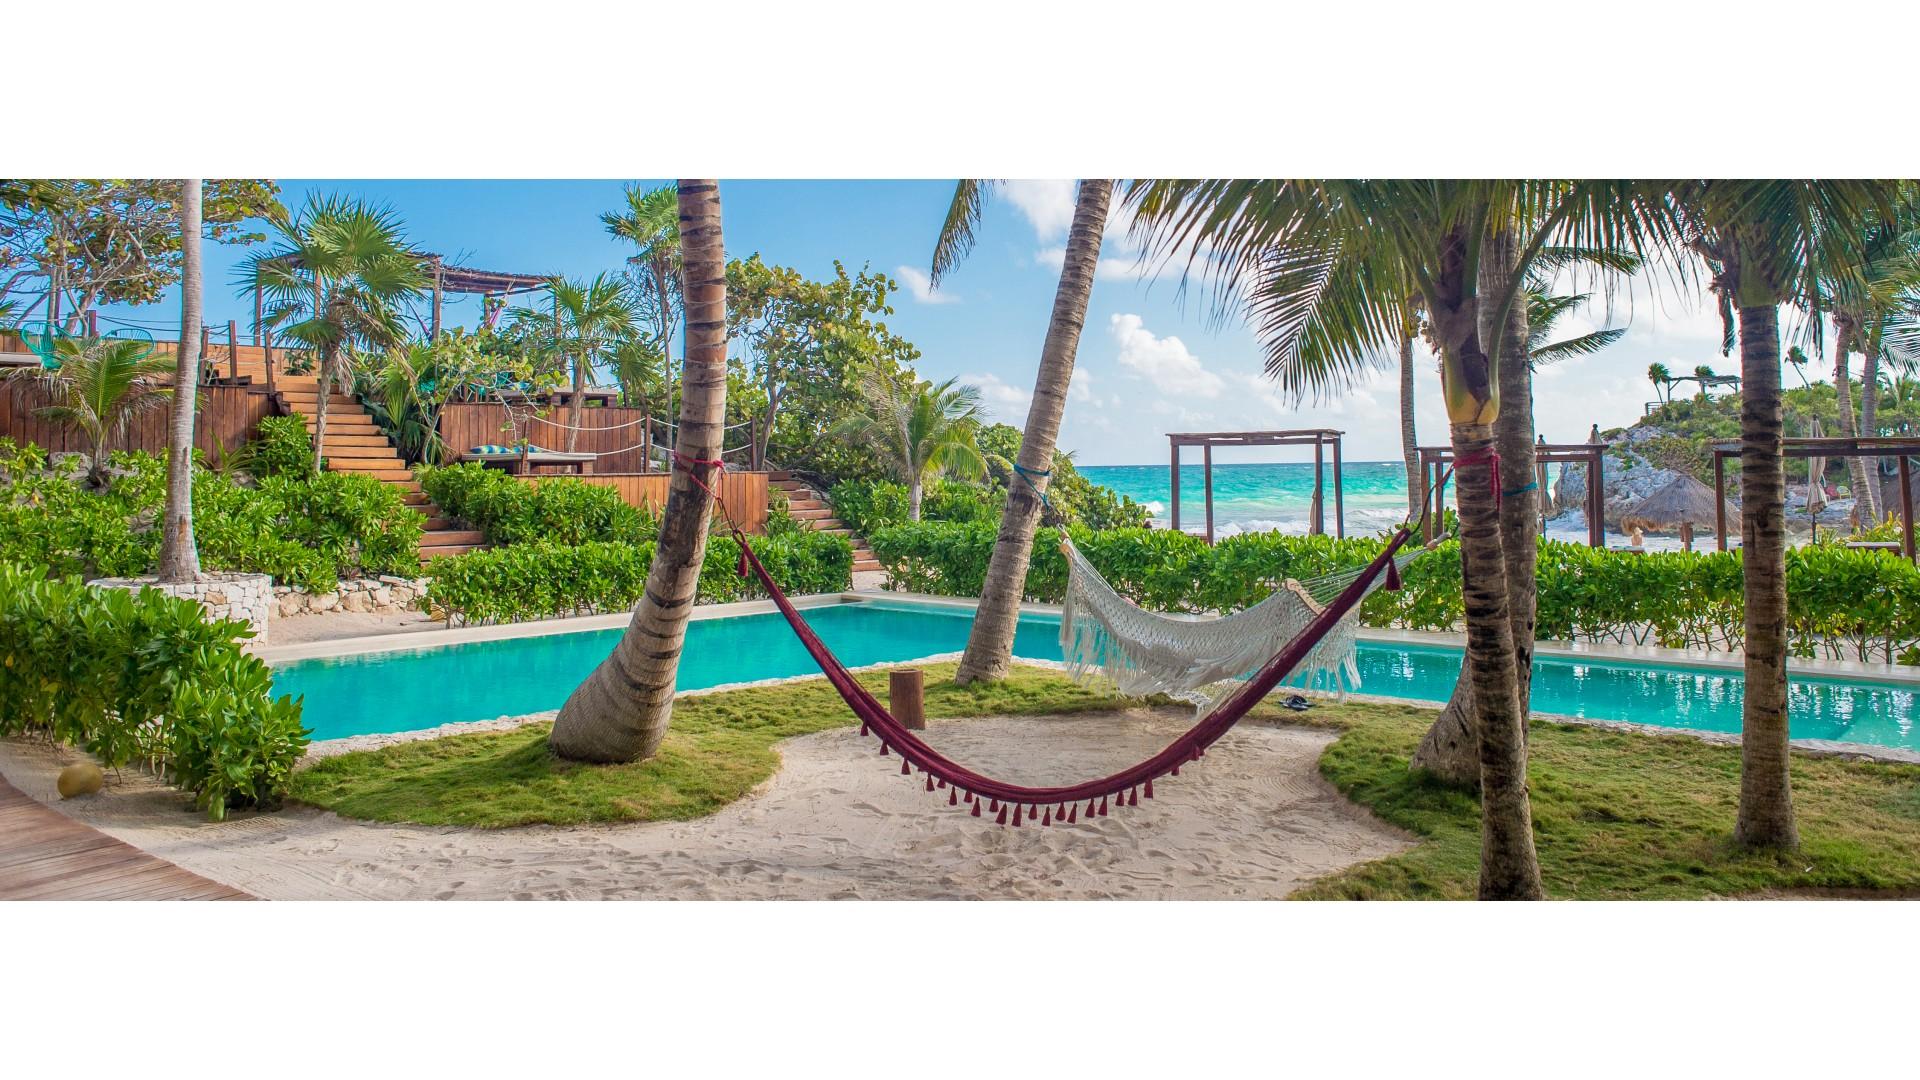 Maria del Mar Tulum hotel Tulum Quintana Roo Smith Hotels